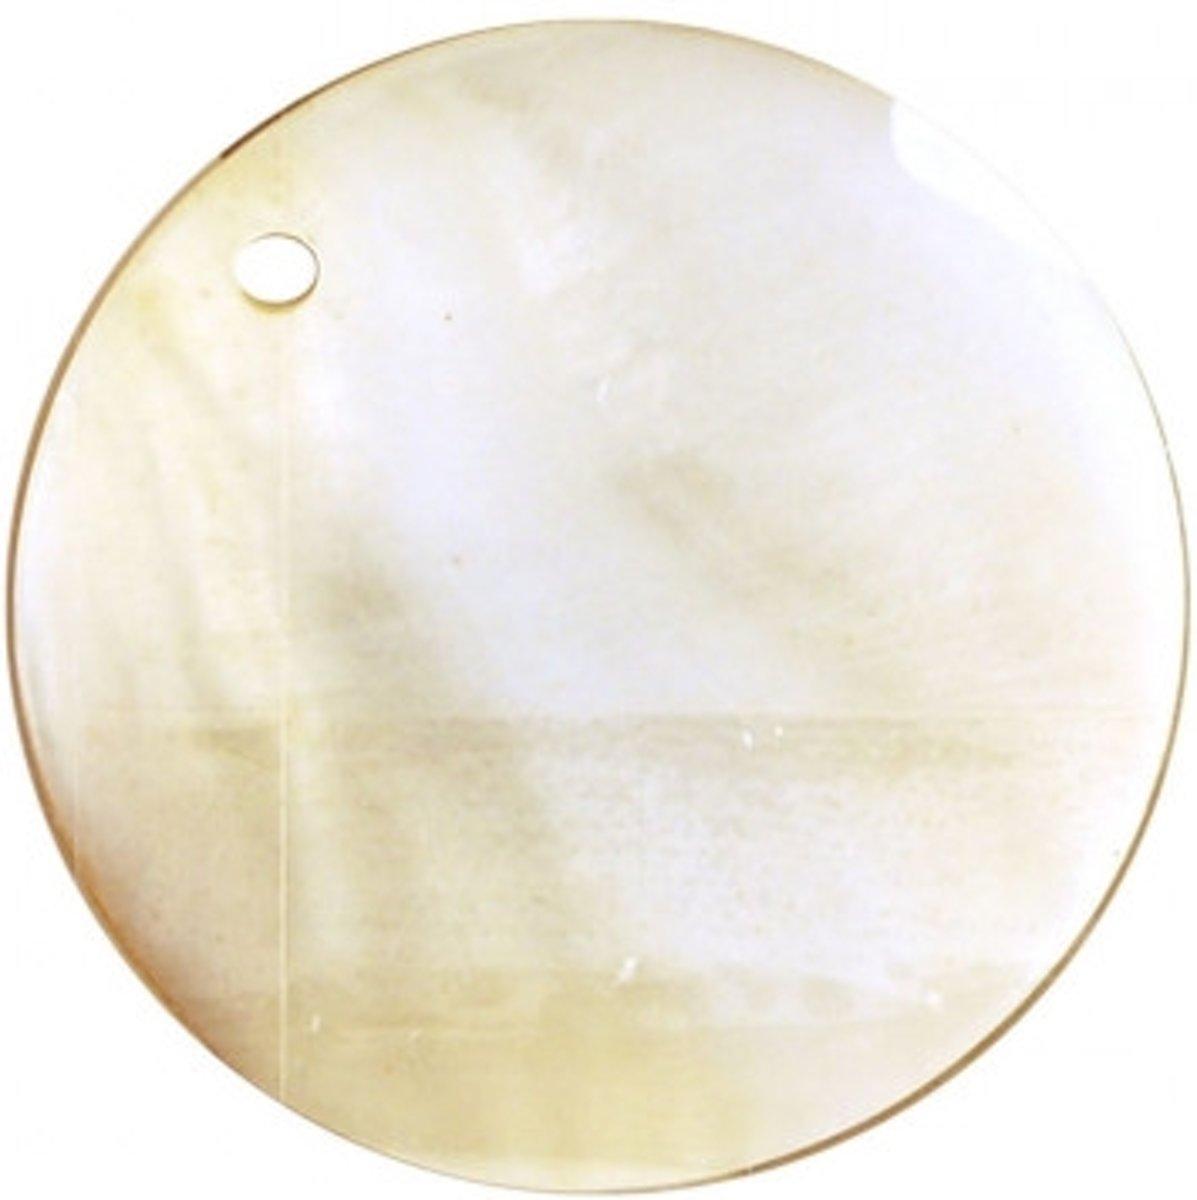 Afbeelding van product Buttons ass. 1 pk. a 2 st. naturel round river shell dangles